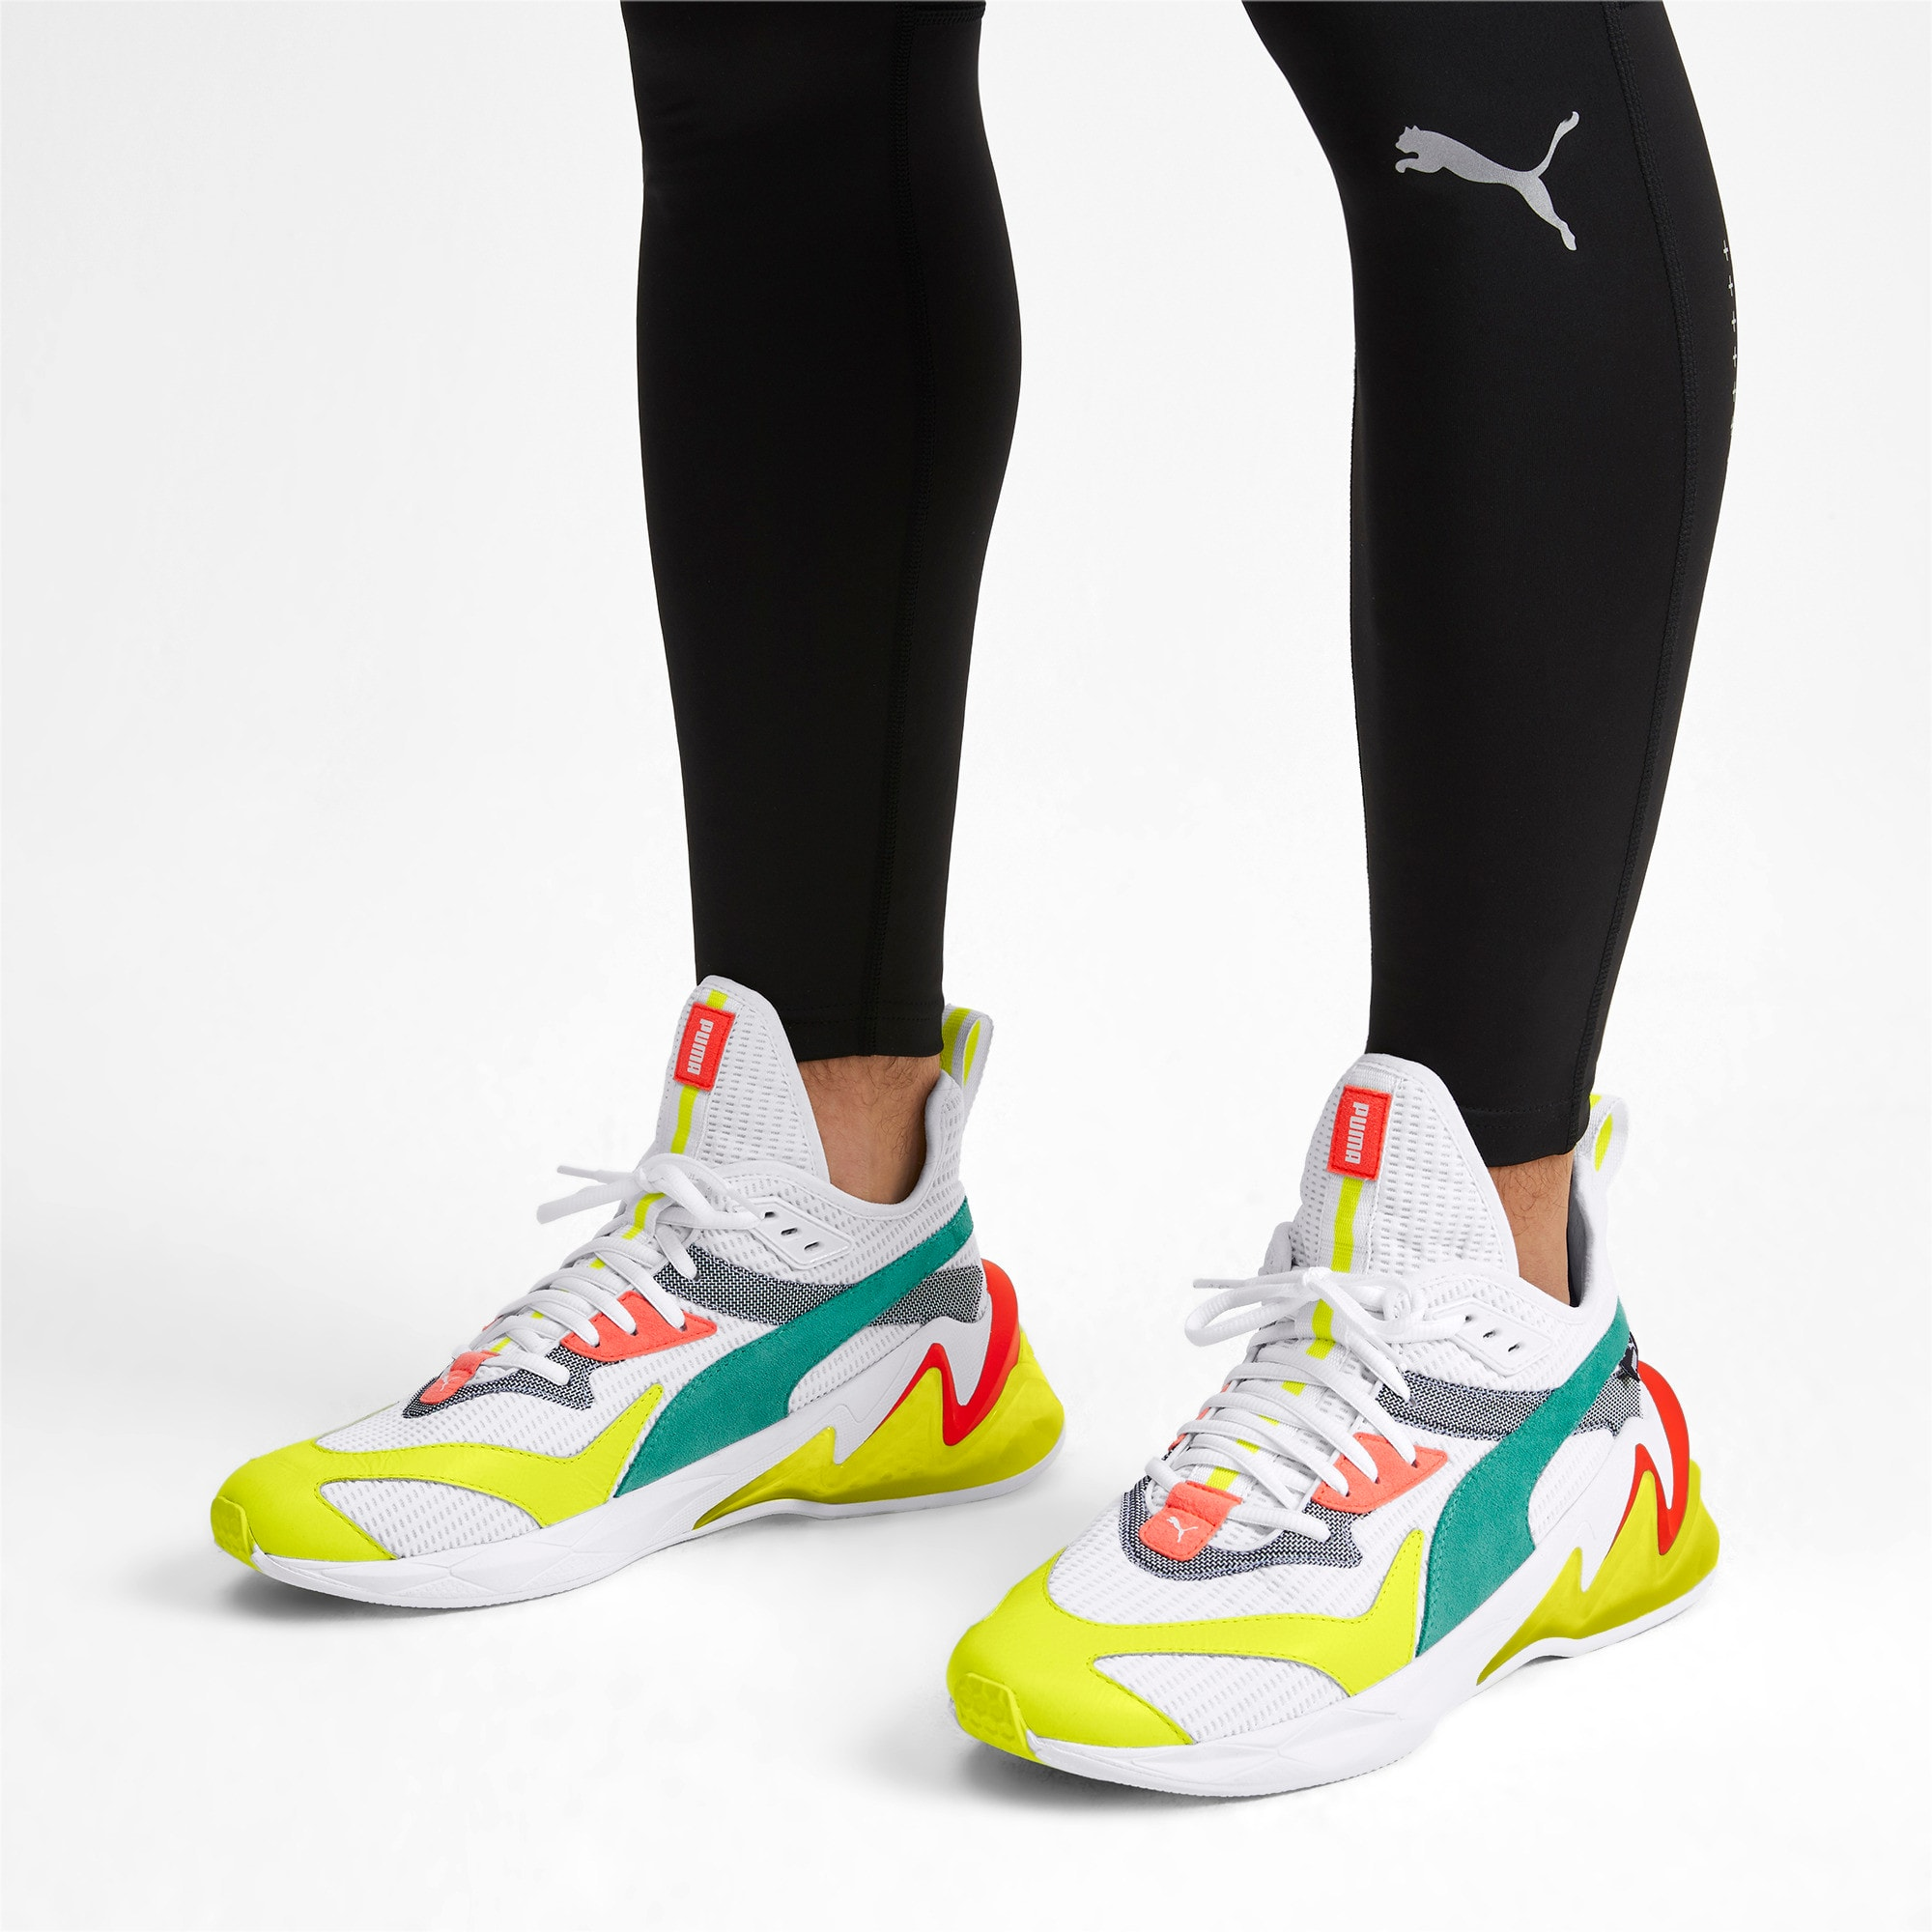 Thumbnail 2 of LQDCELL Origin Men's Shoes, Puma White-Yellow Alert, medium